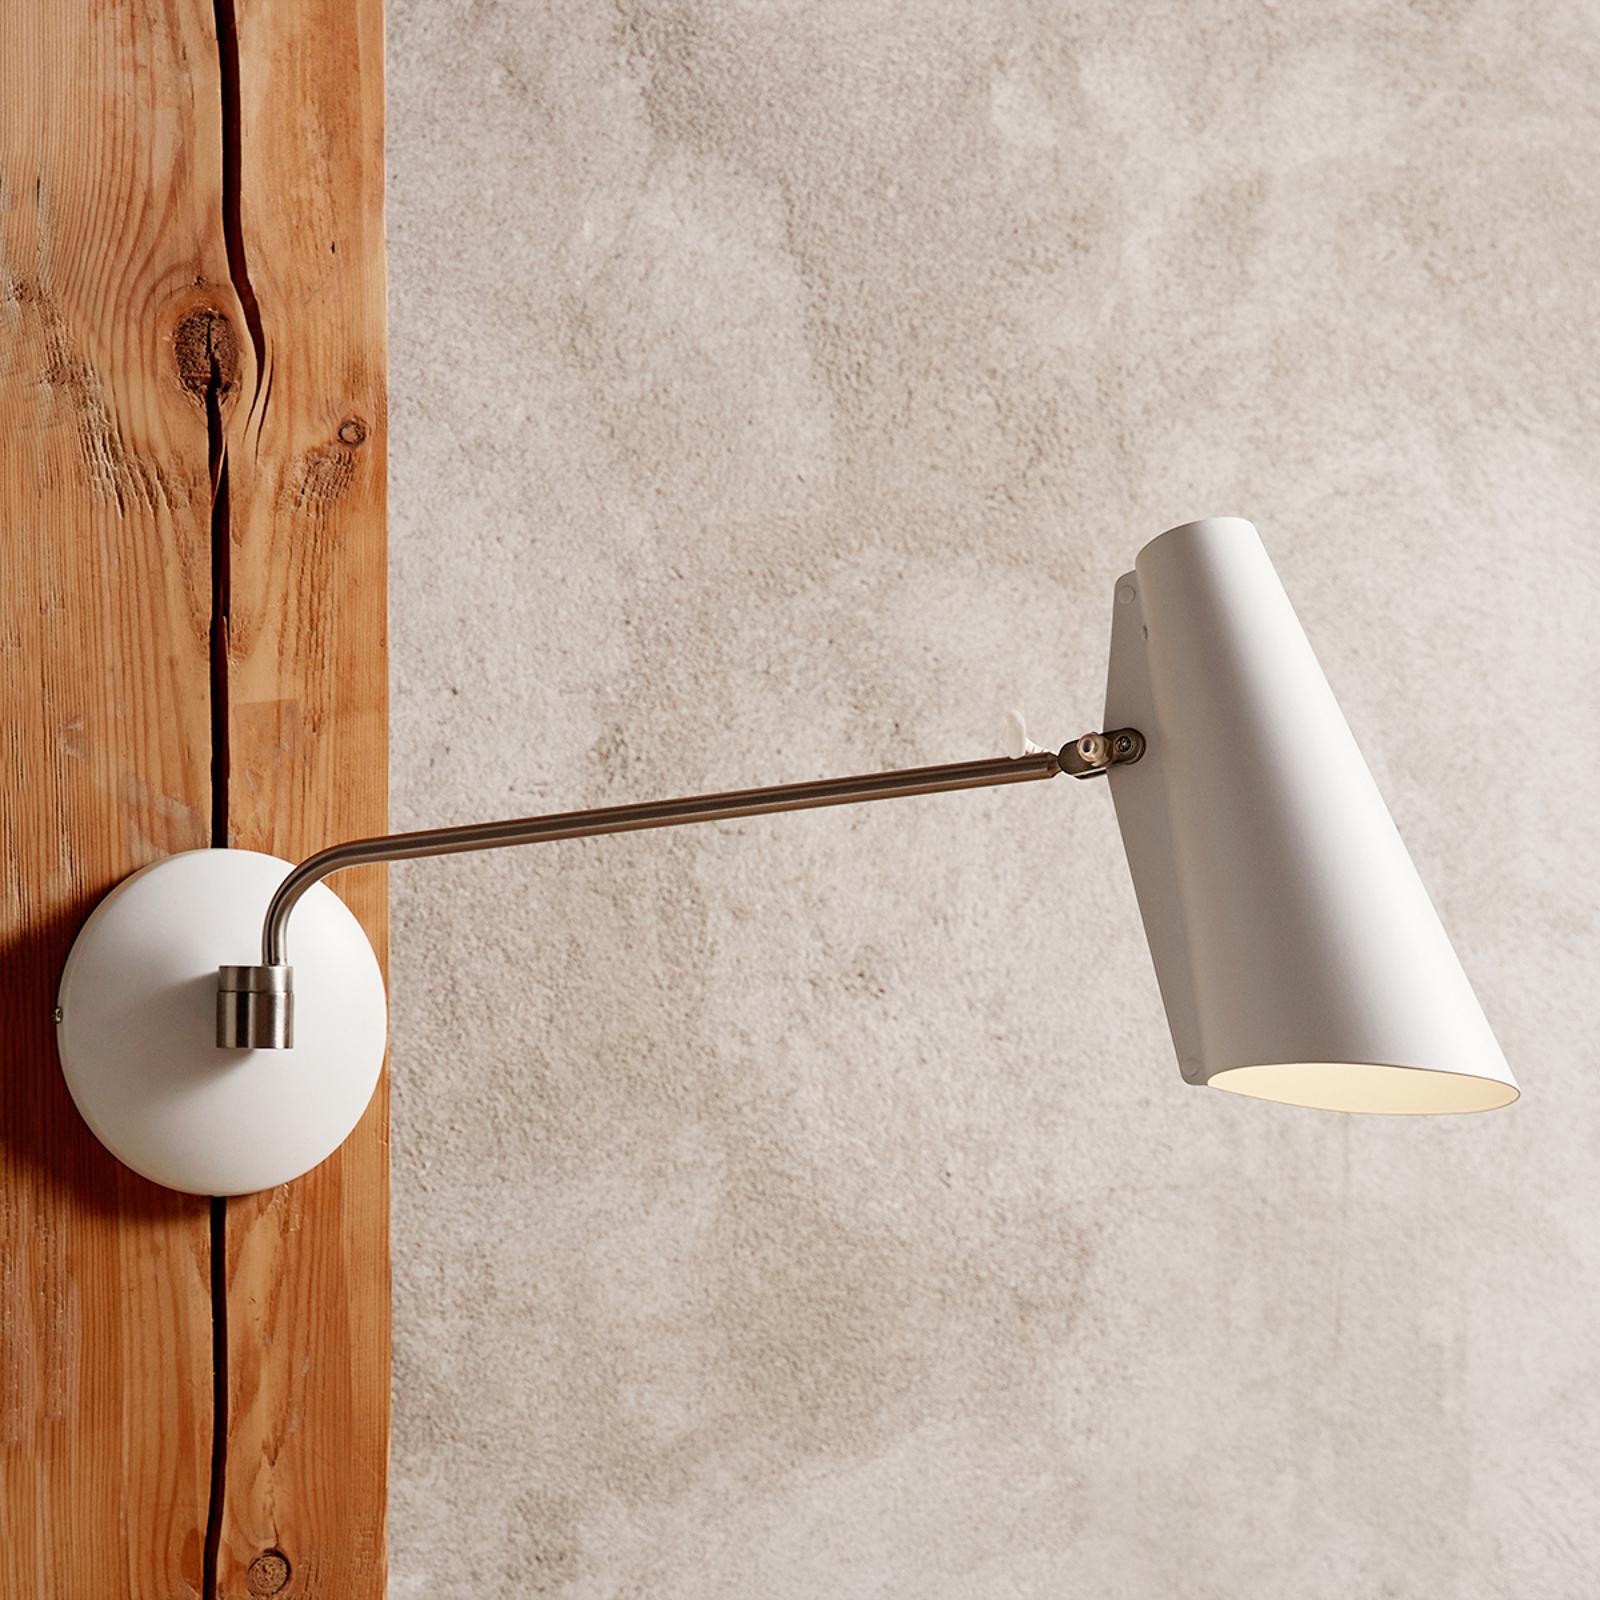 Northern Birdy - hvid retro-væglampe